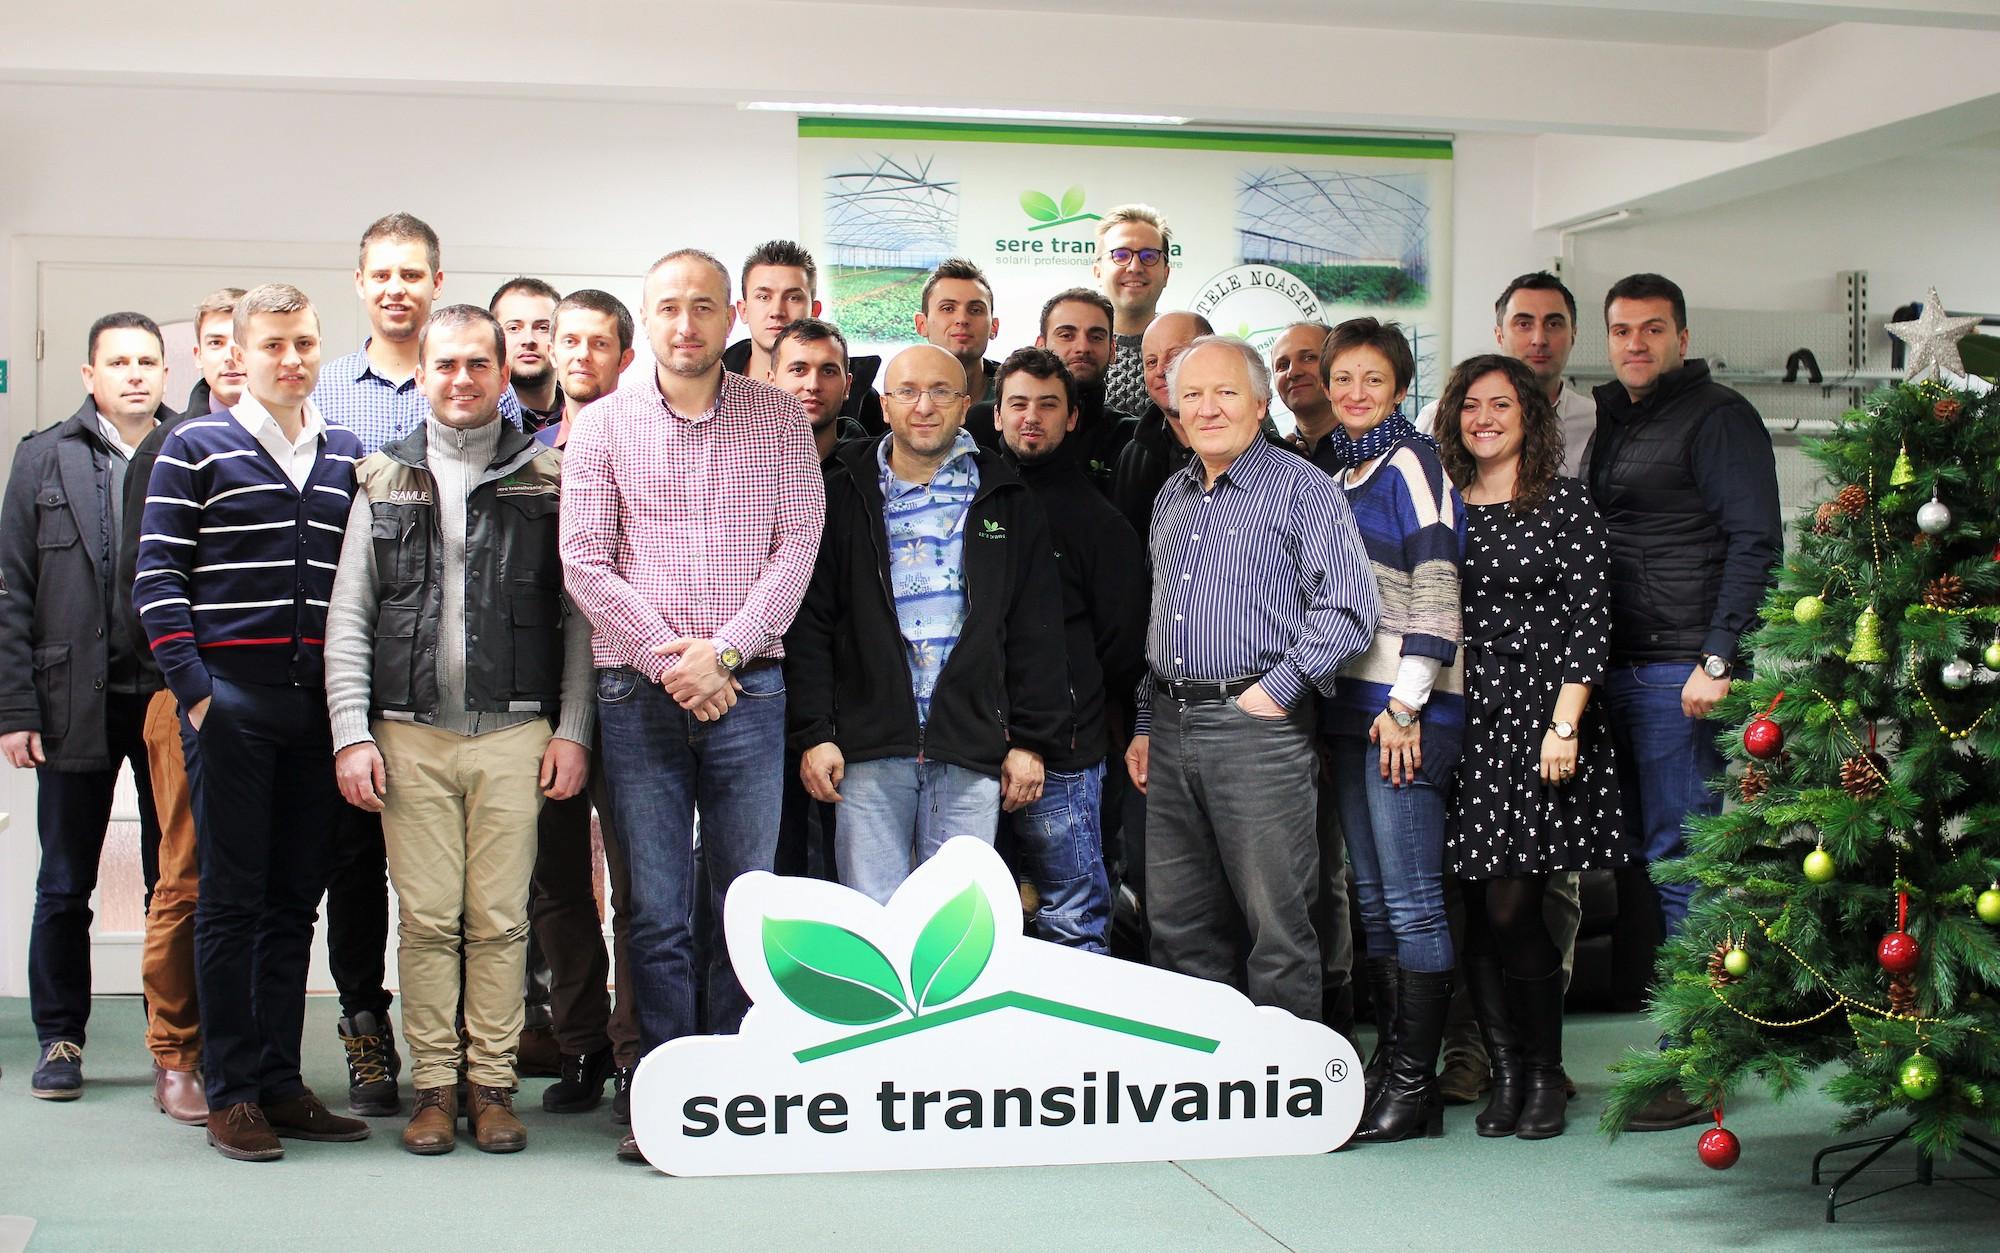 Sere Transilvania team Christmas 2016